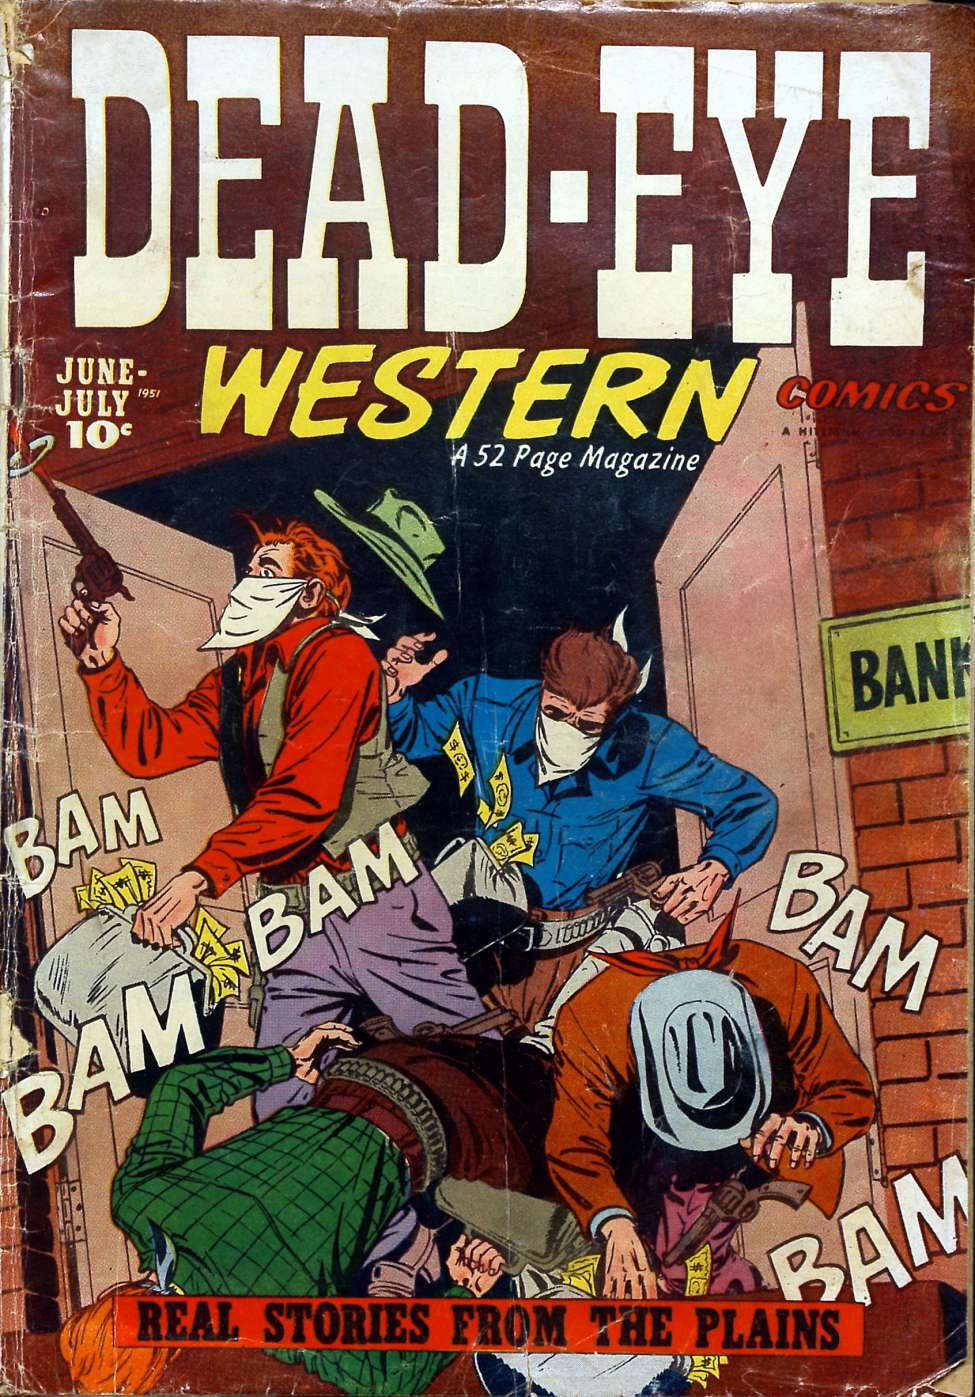 Comic Book Cover For Dead-Eye Western Comics v2 #4